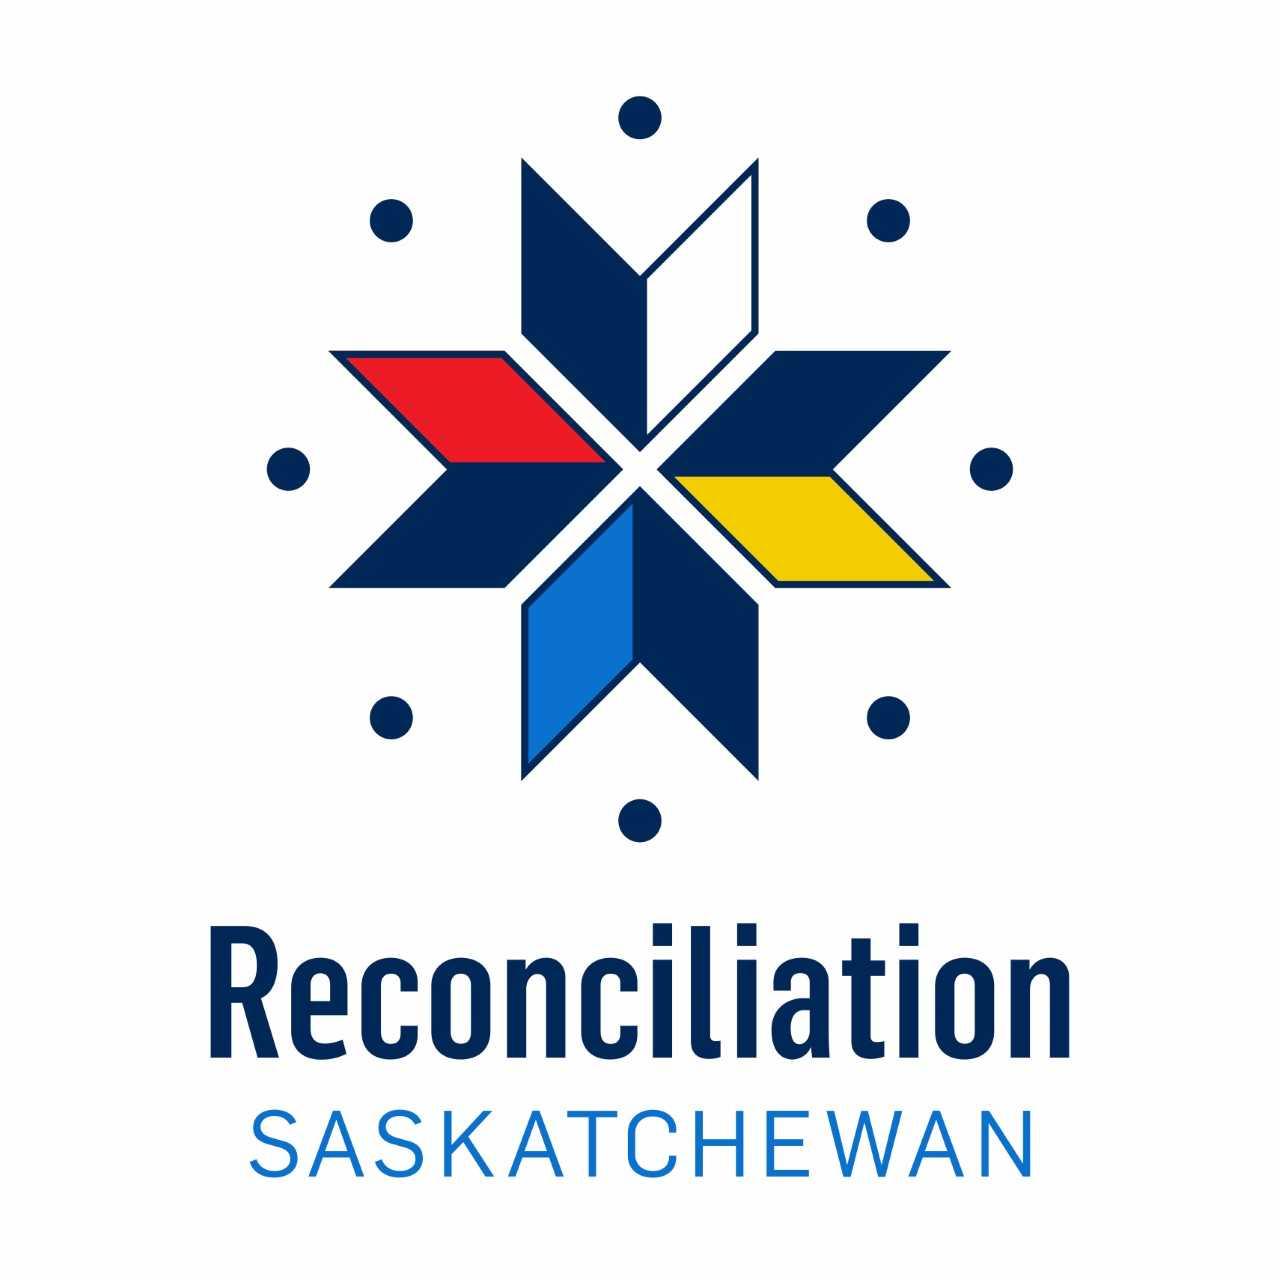 Reconciliation Saskatchewan Logo.jpeg